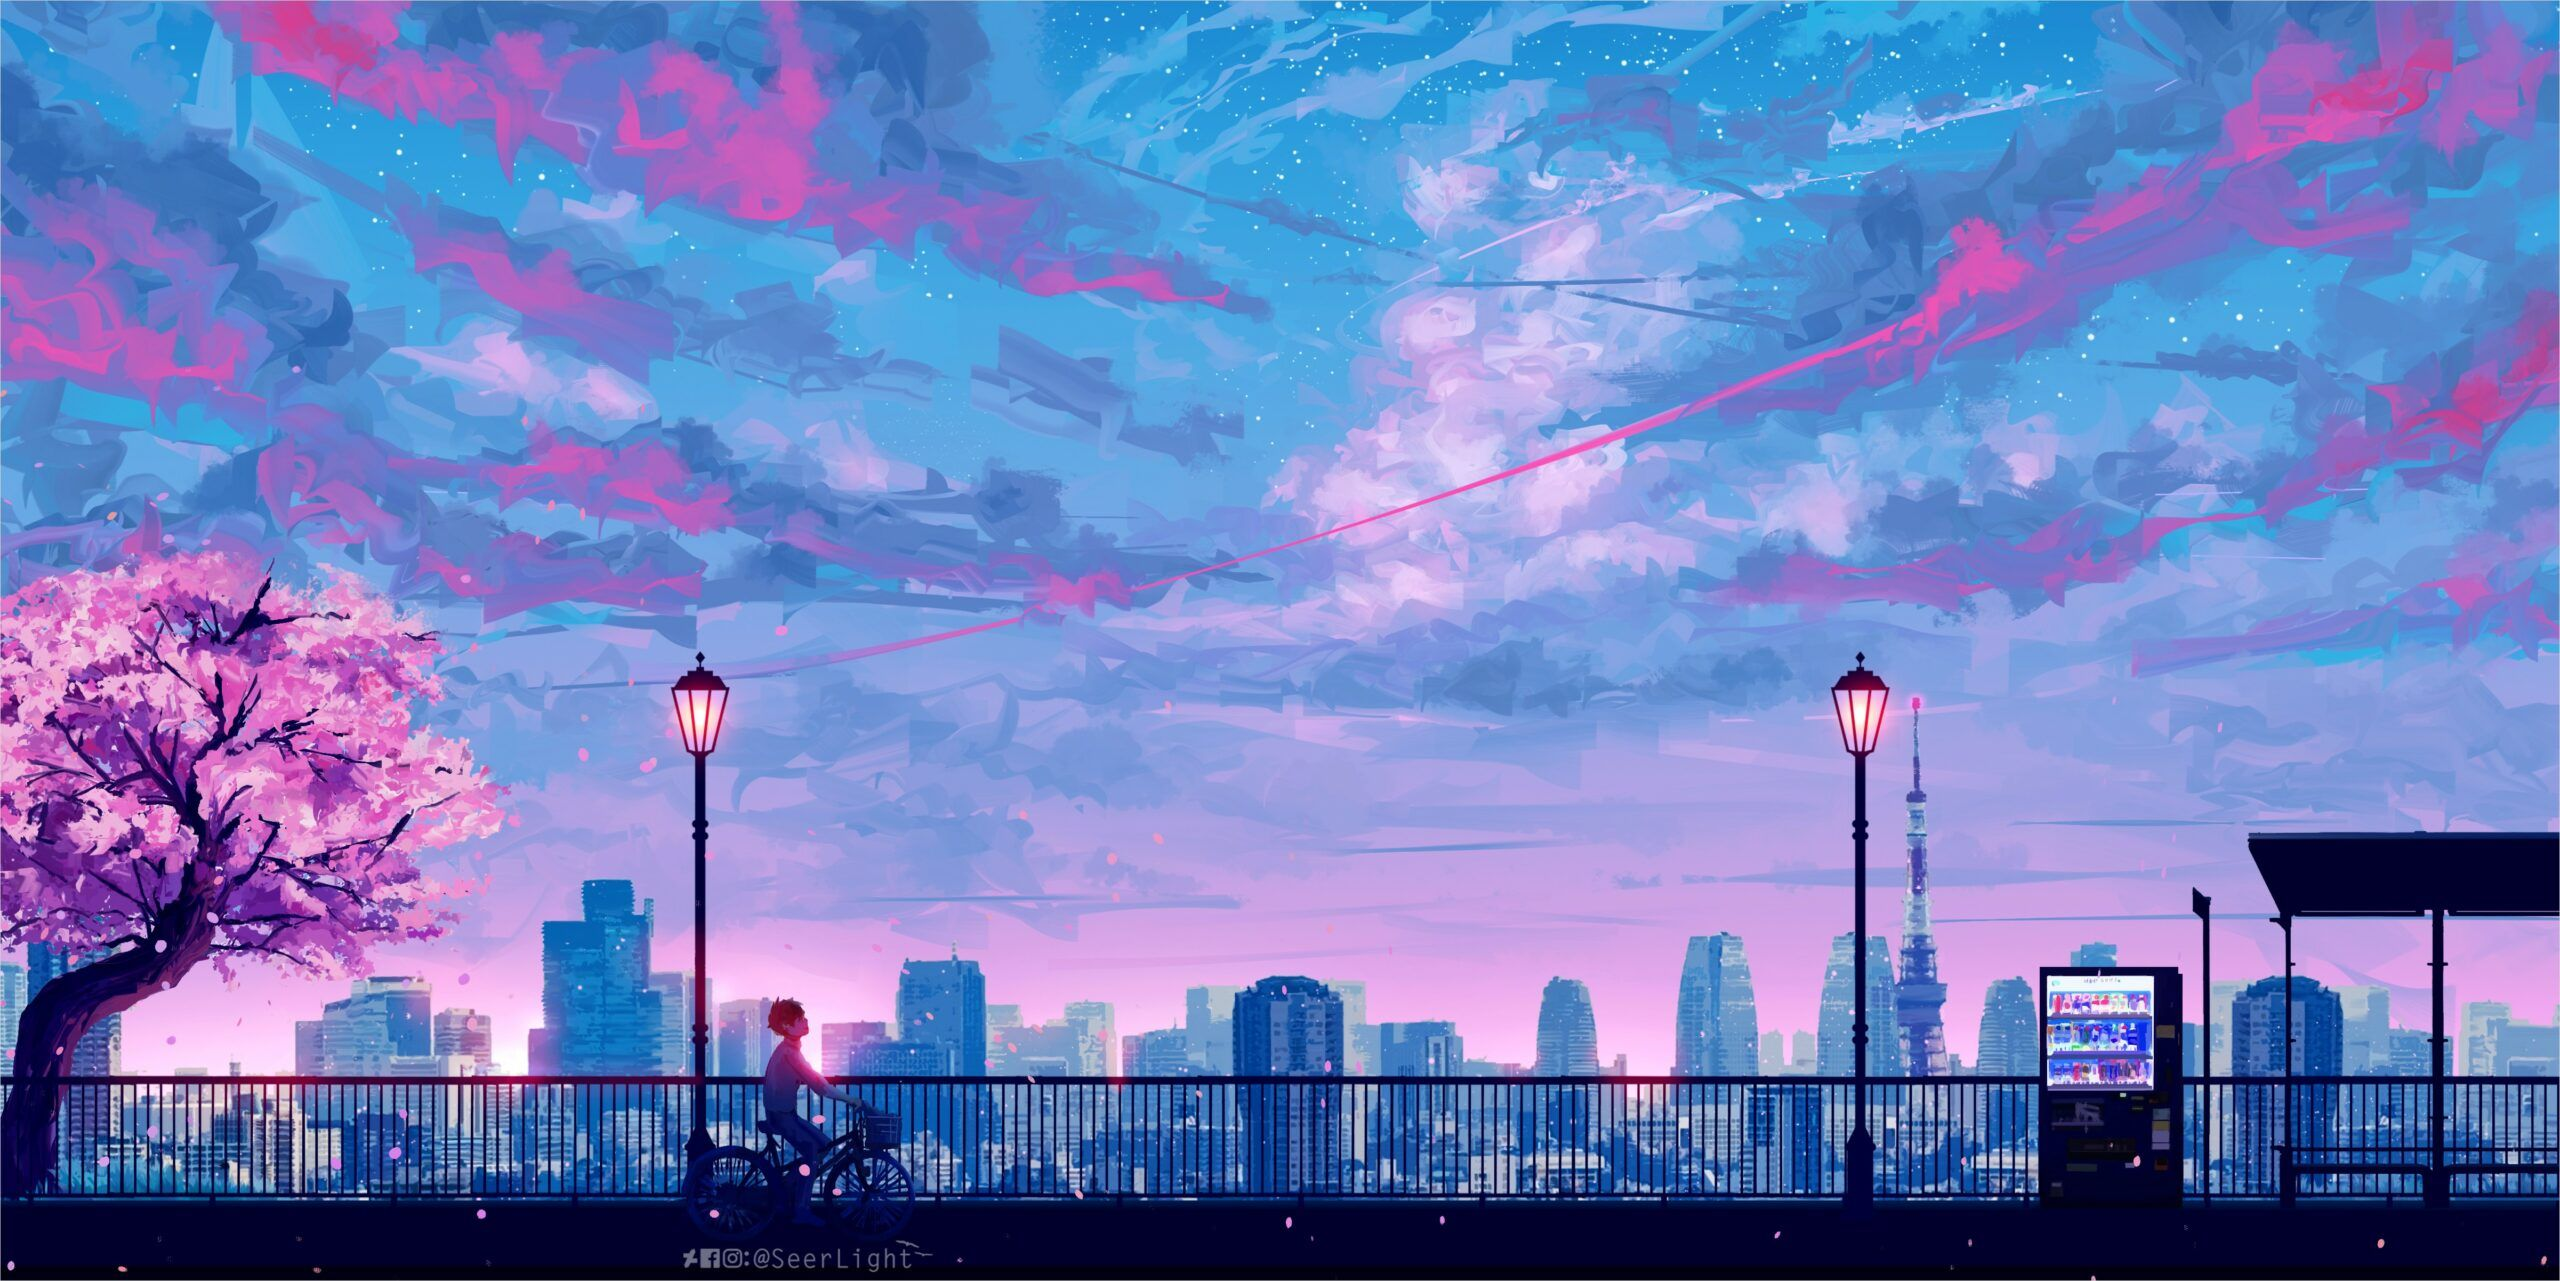 4k Anime Landscape Wallpapers Papel De Parede Do Notebook Papel De Parede De Arte Papeis De Parede Esteticos